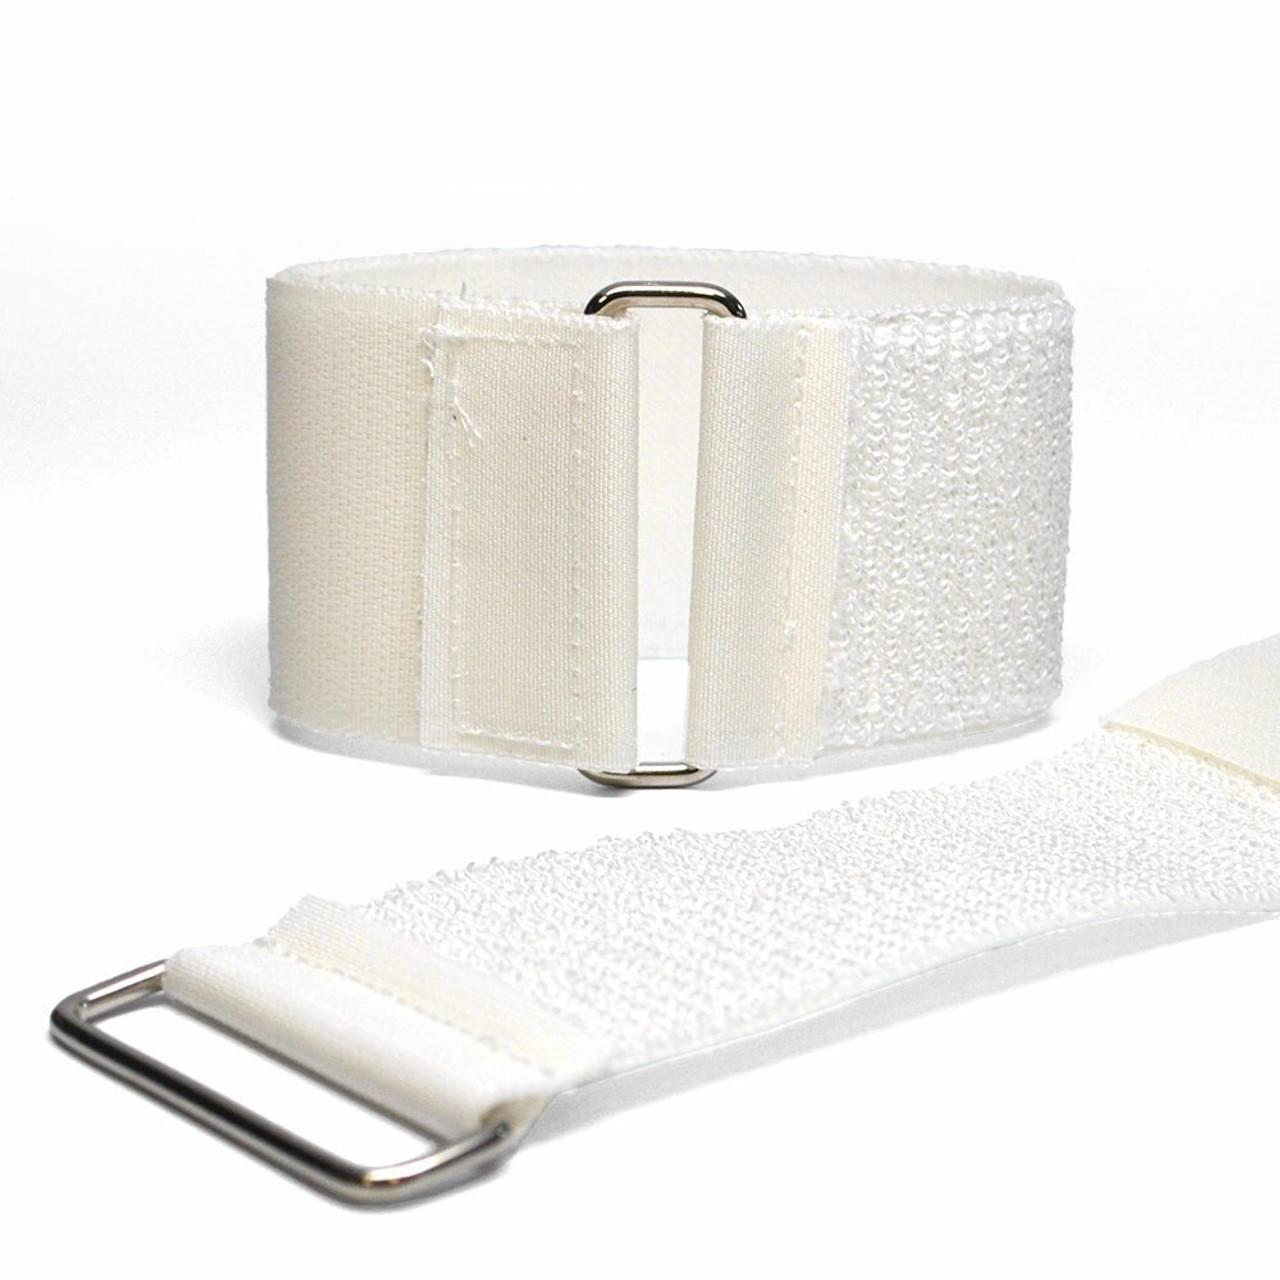 VELCRO ® Brand Straps - VELSTRAP® HI-AIR® Cinch Straps / Velcro Straps - Bundling Straps - Velcro Tie - Velcro Strap